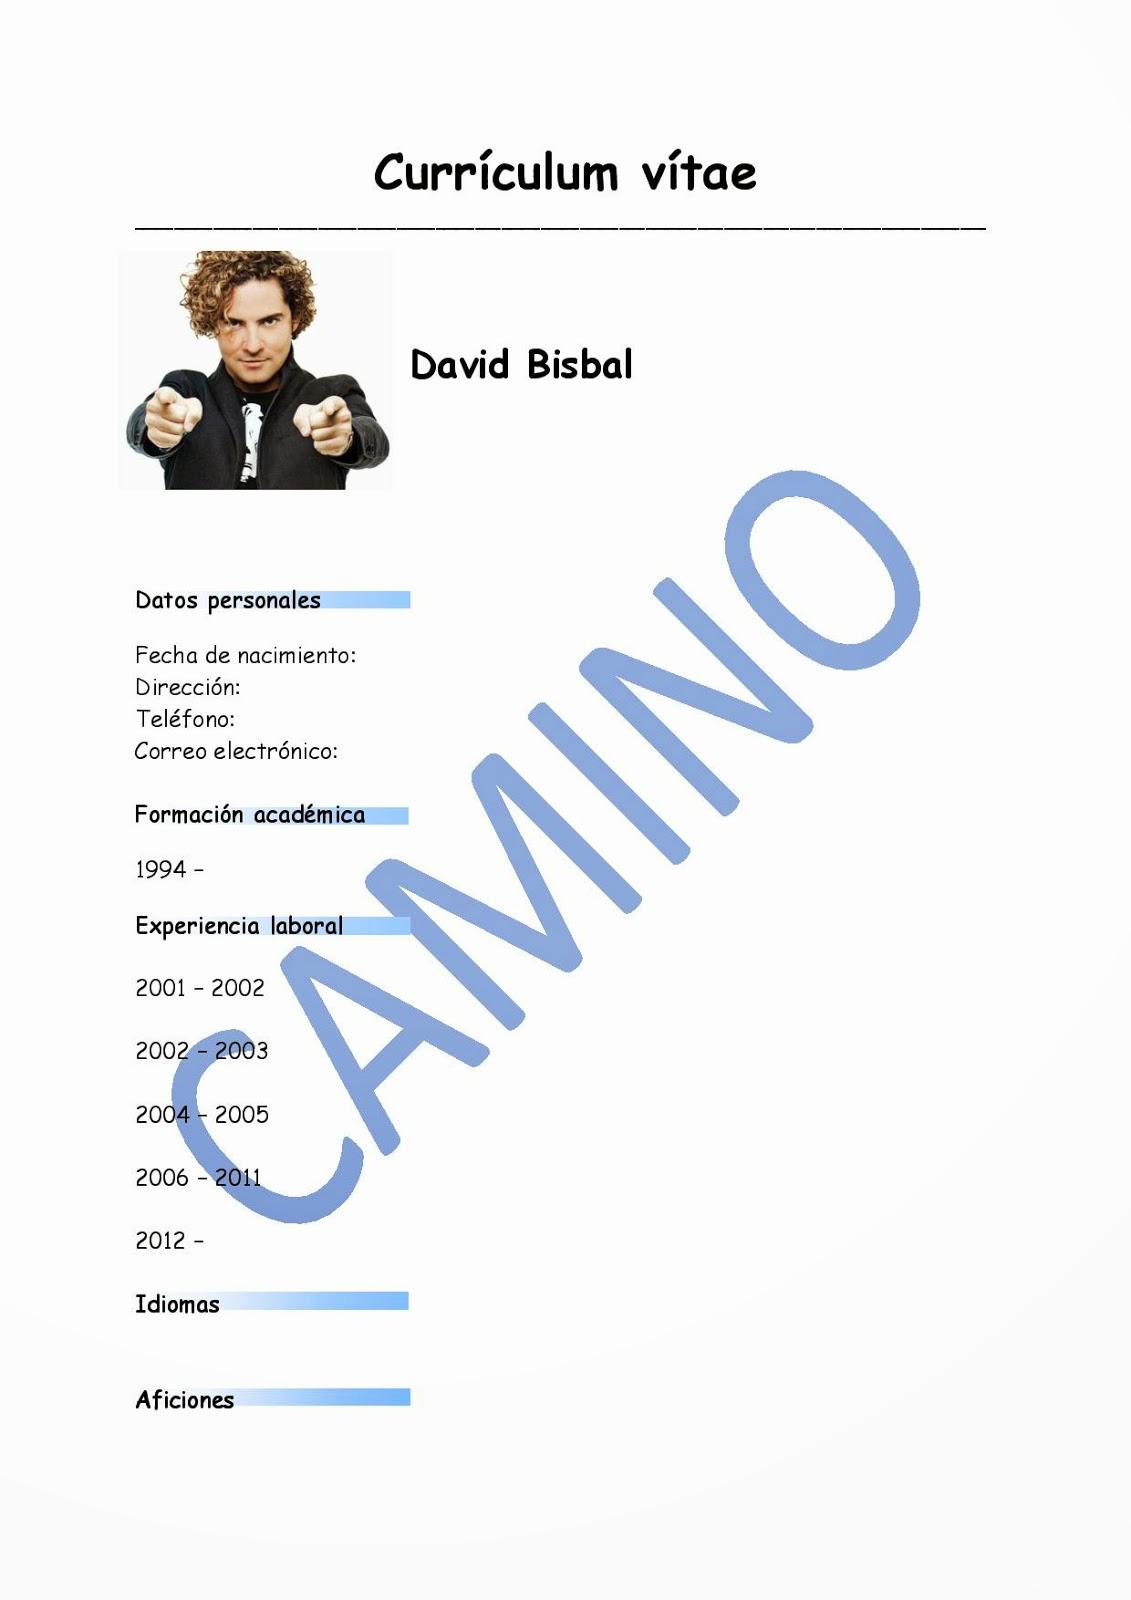 Camino Espanol Curriculum Vitae De David Bisbal A2